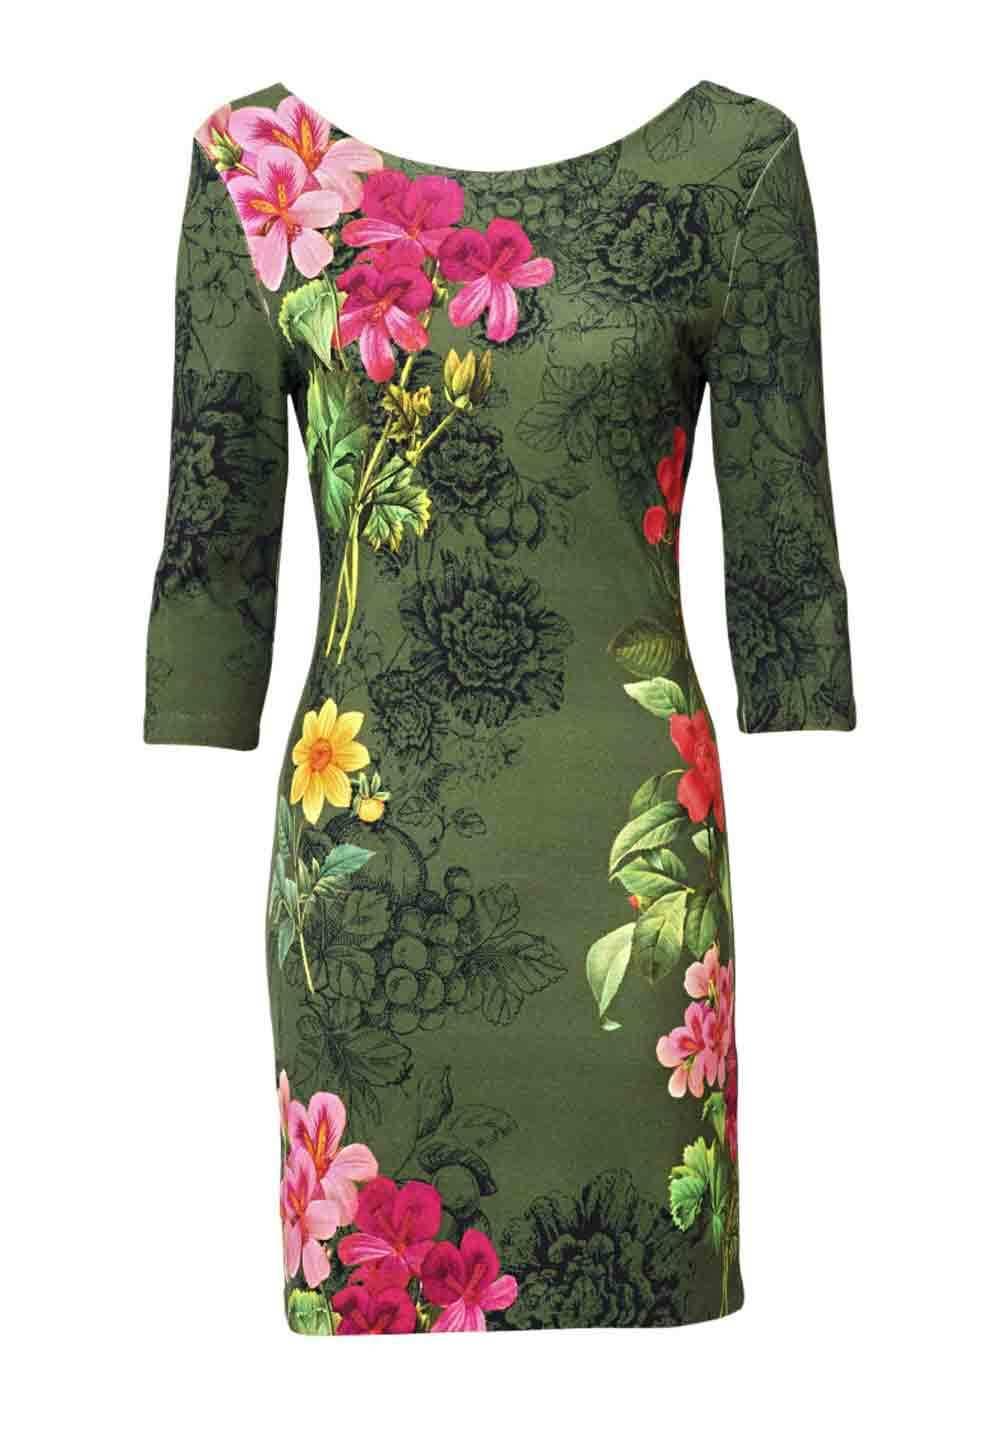 Designer Kleid Desigual Größe L NEU